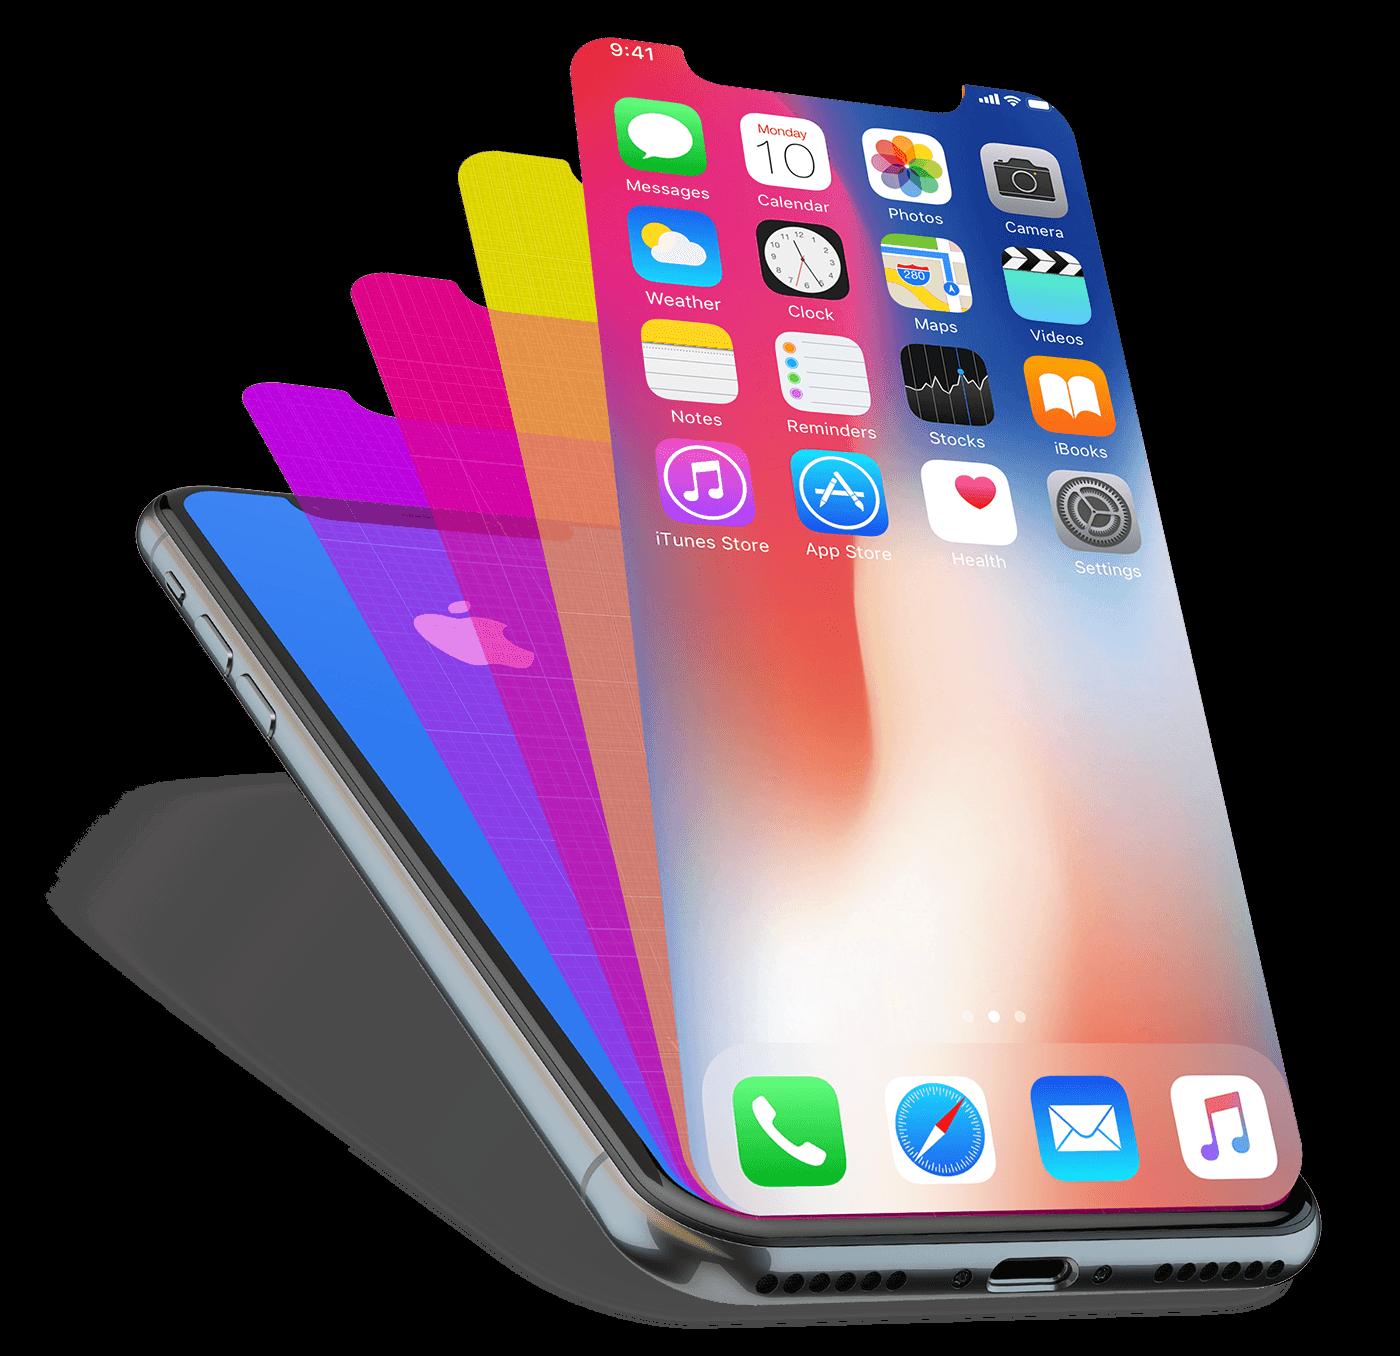 iOS 12 Problems] Fix My iPhone - Repair White Apple, Boot